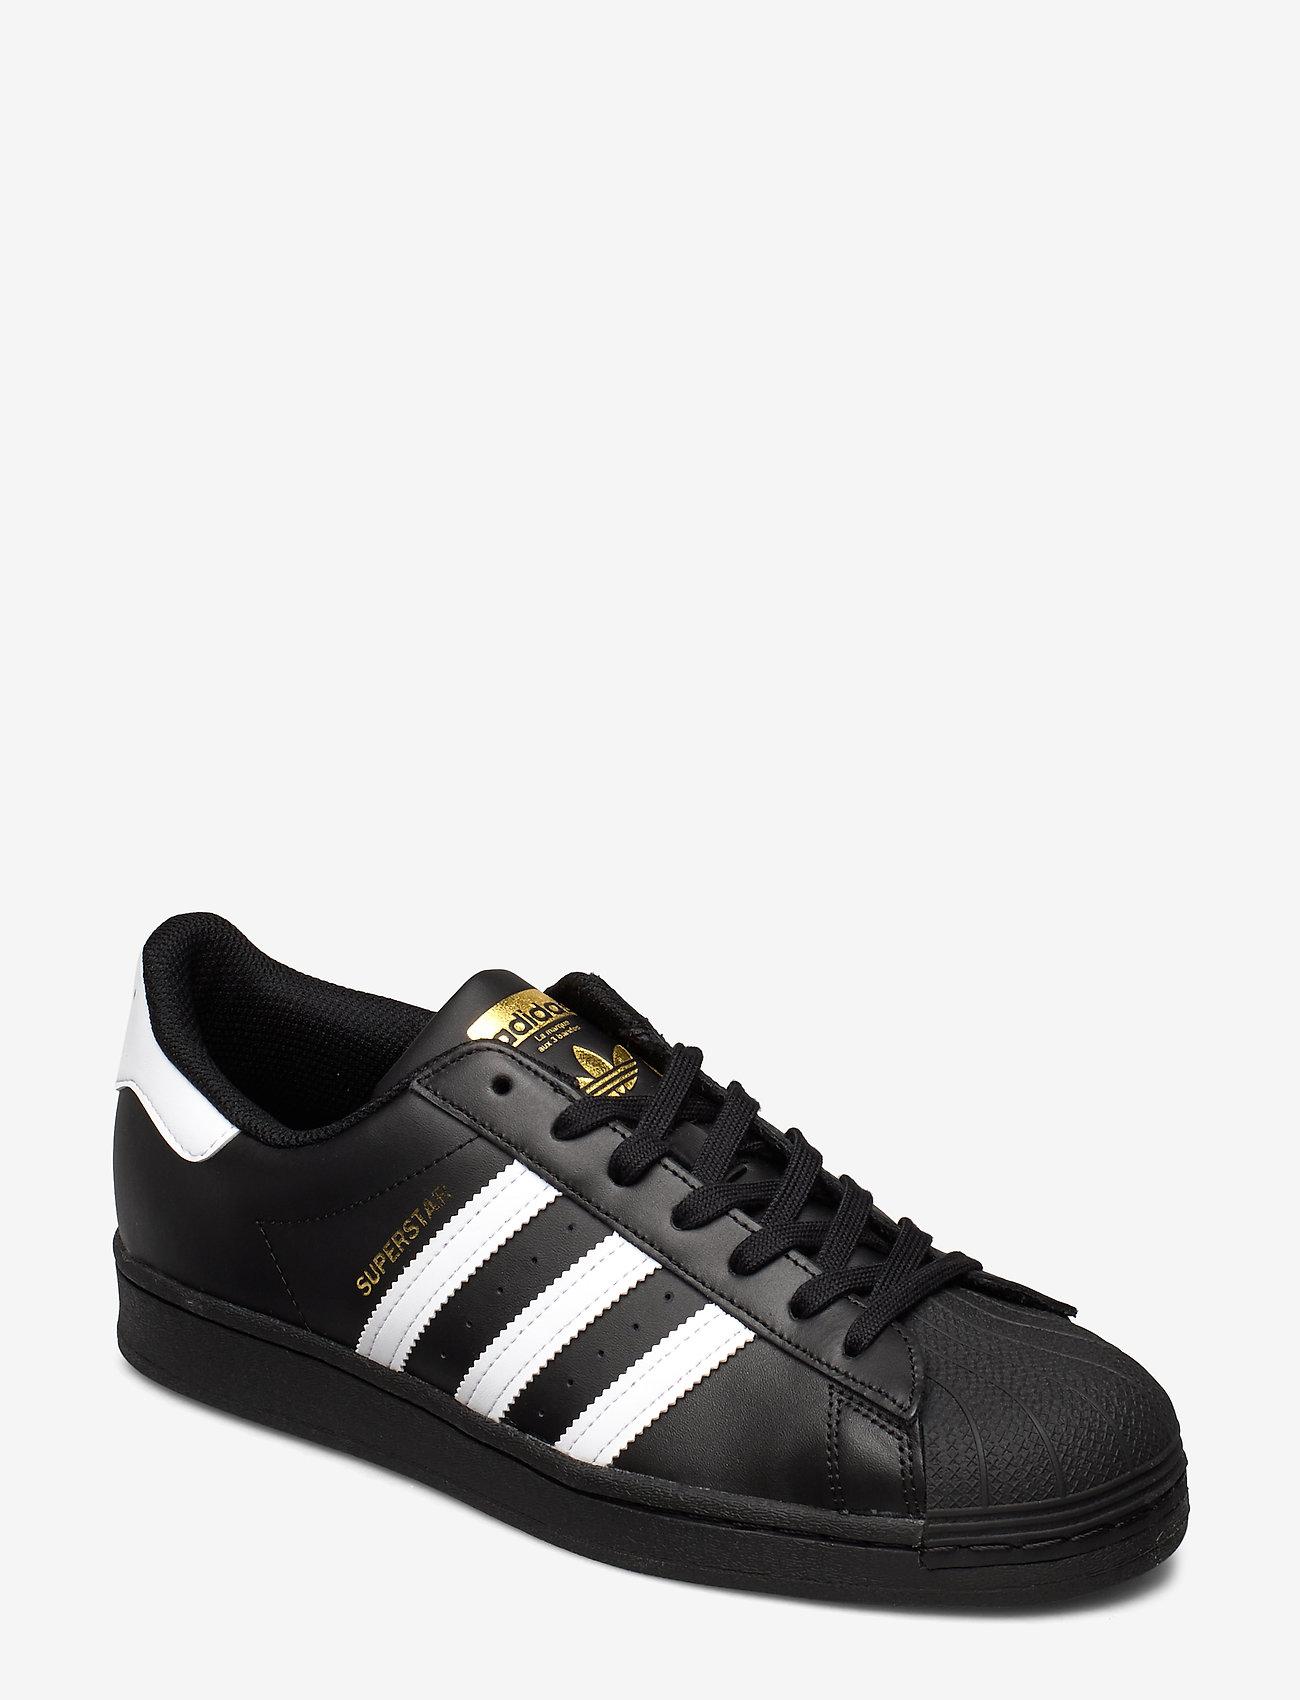 Superstar (Cblackftwwhtcblack) (1099 kr) adidas